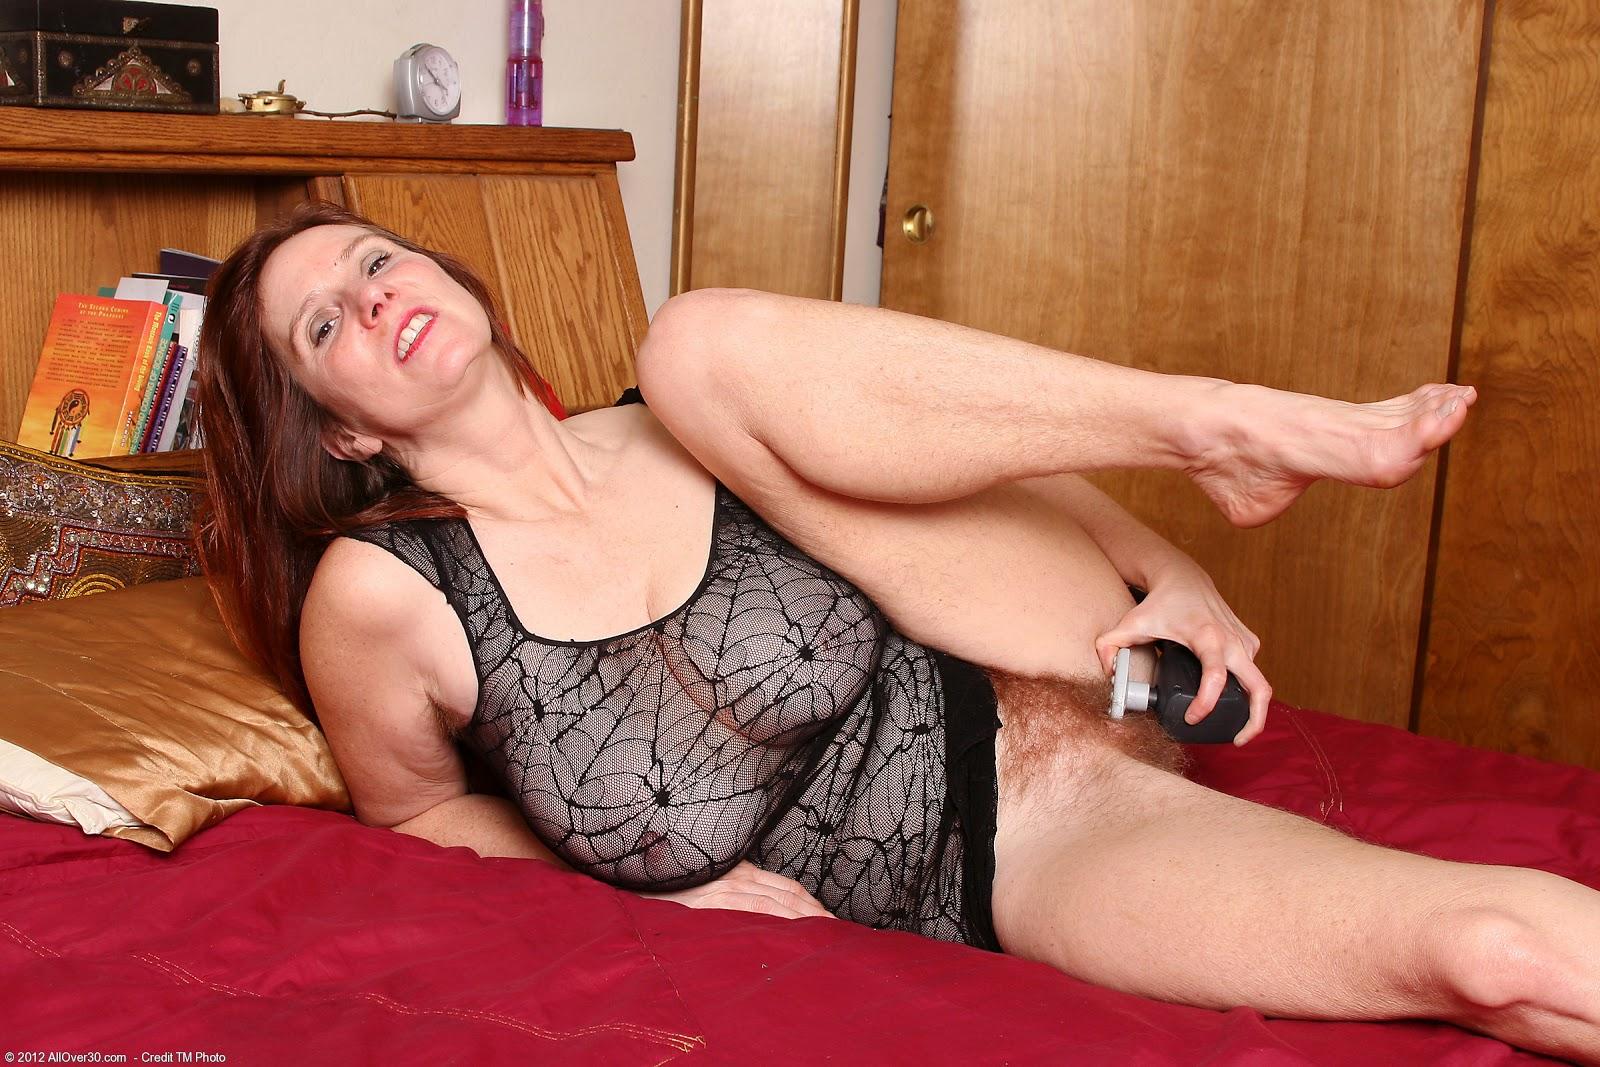 nude hot real jailbait girls